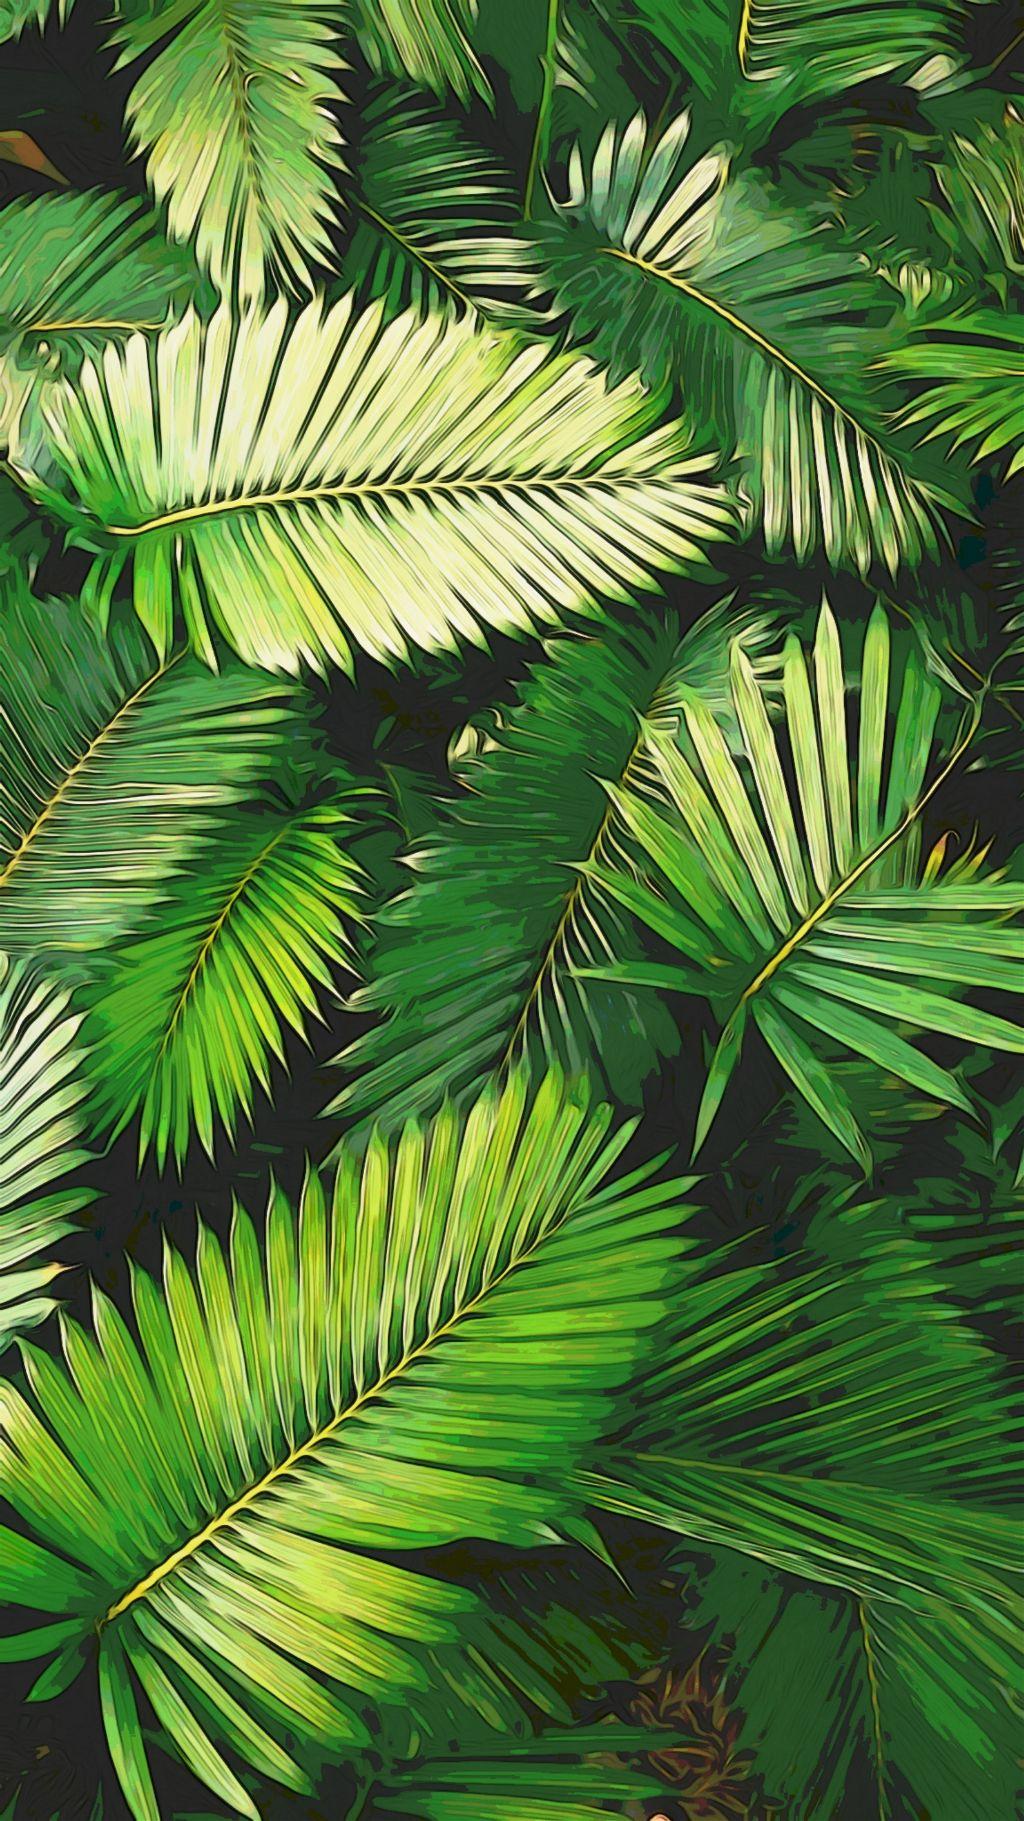 Unduh 700 Background Aesthetic Green Hd Paling Keren Download Background